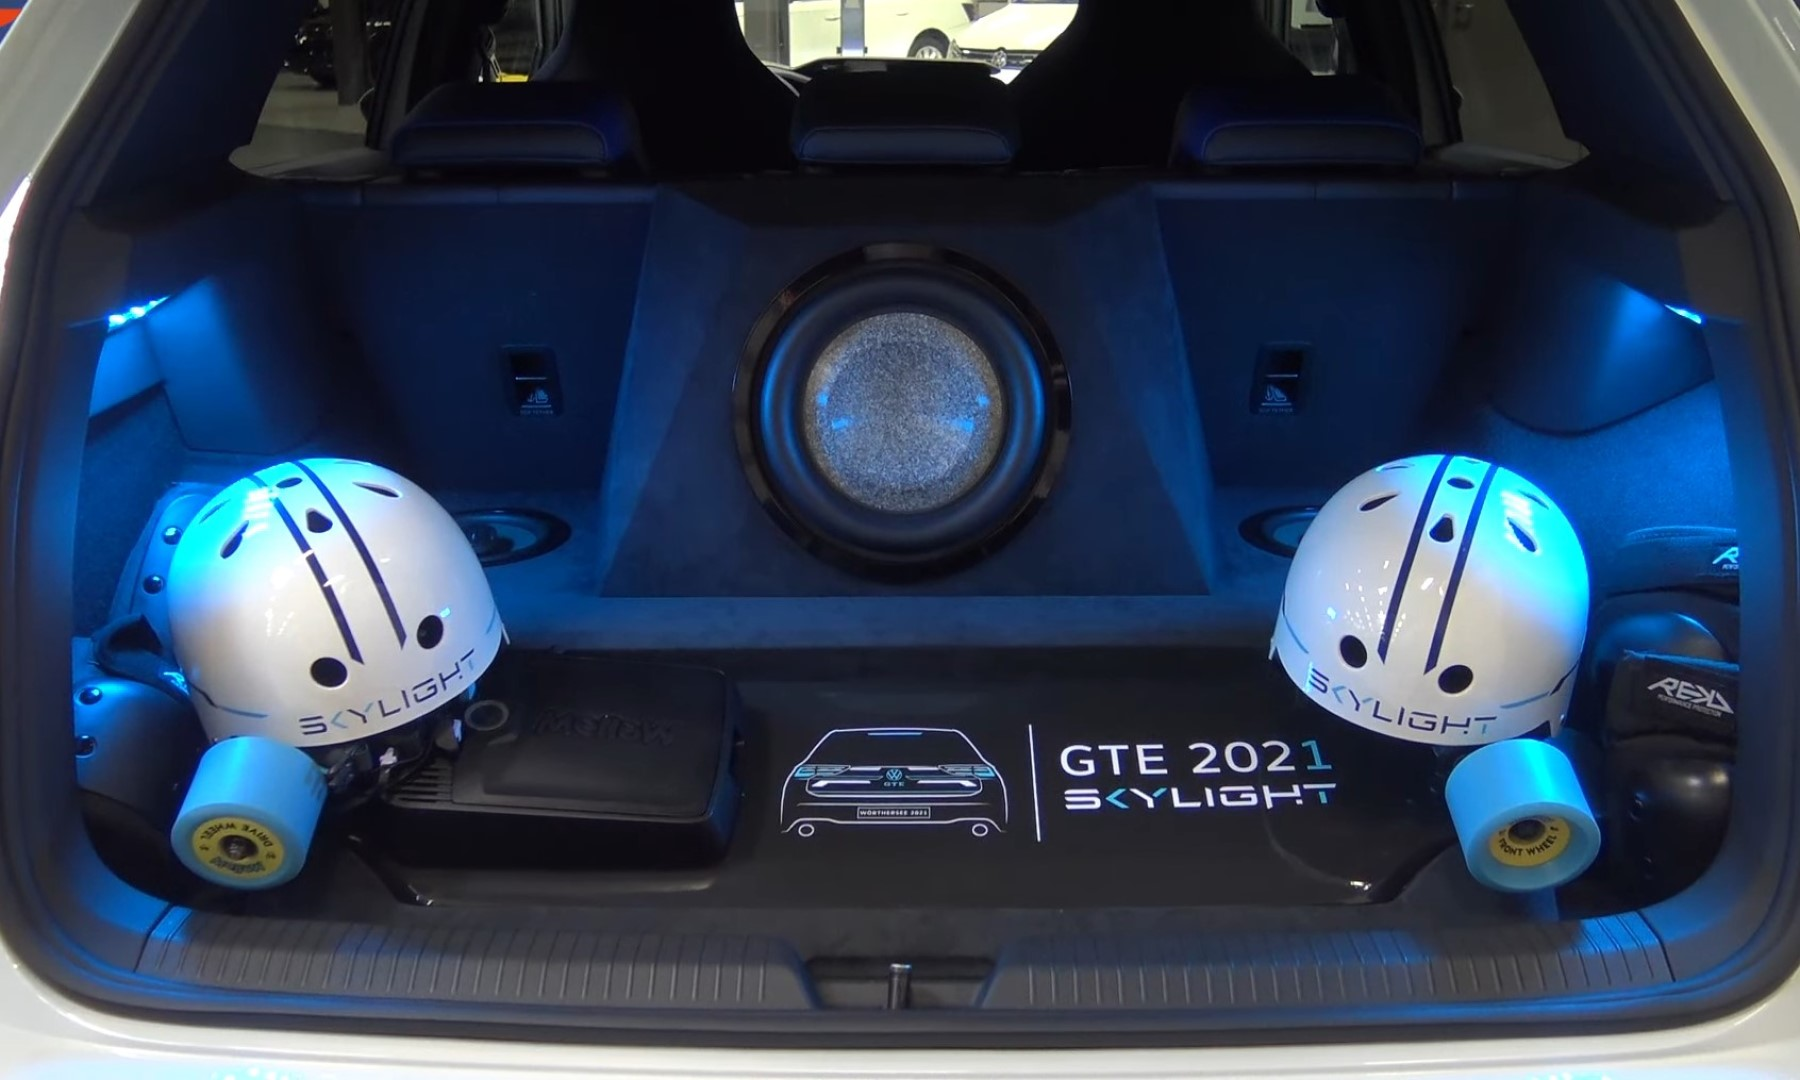 VW Golf GTE Skylight boot